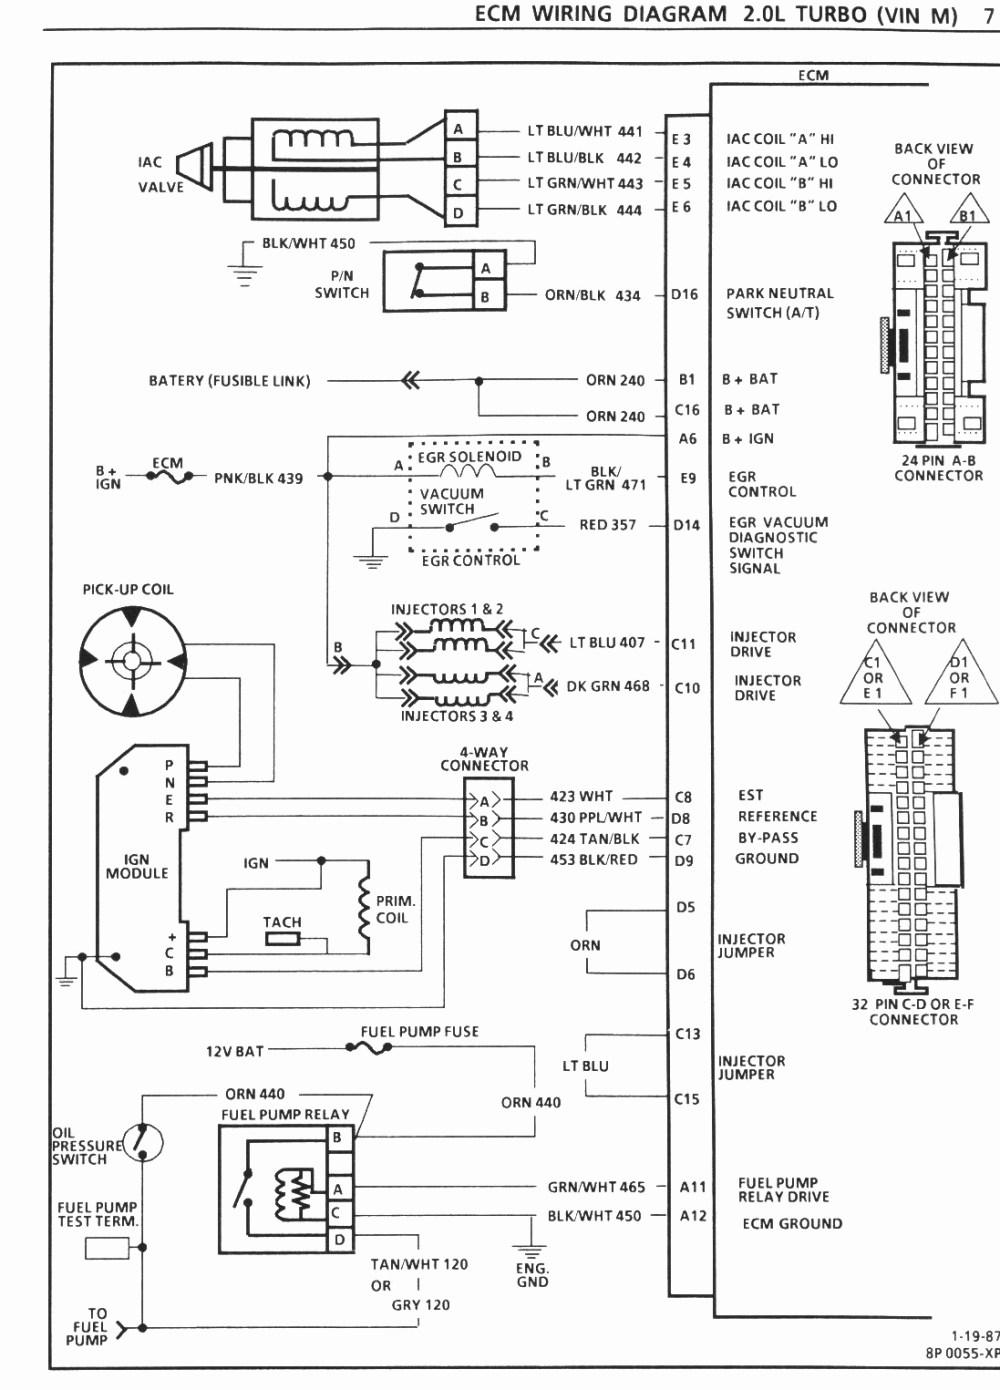 medium resolution of ddec v ecm wiring wiring diagram basicddec 5 ecm wiring diagram manual e bookddec v ecm